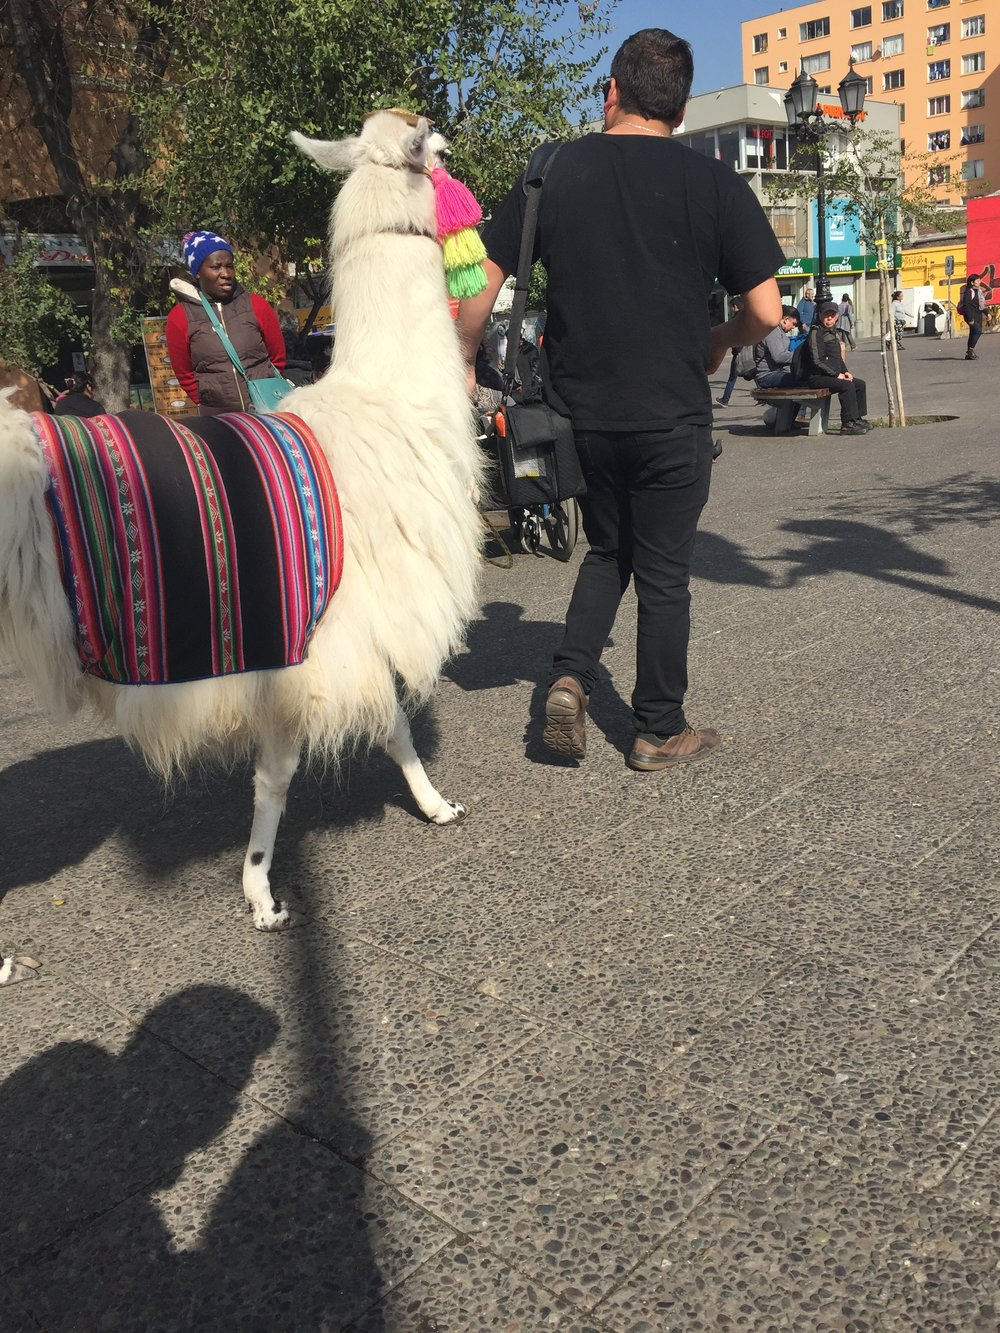 This alpaca wouldn't look at me.